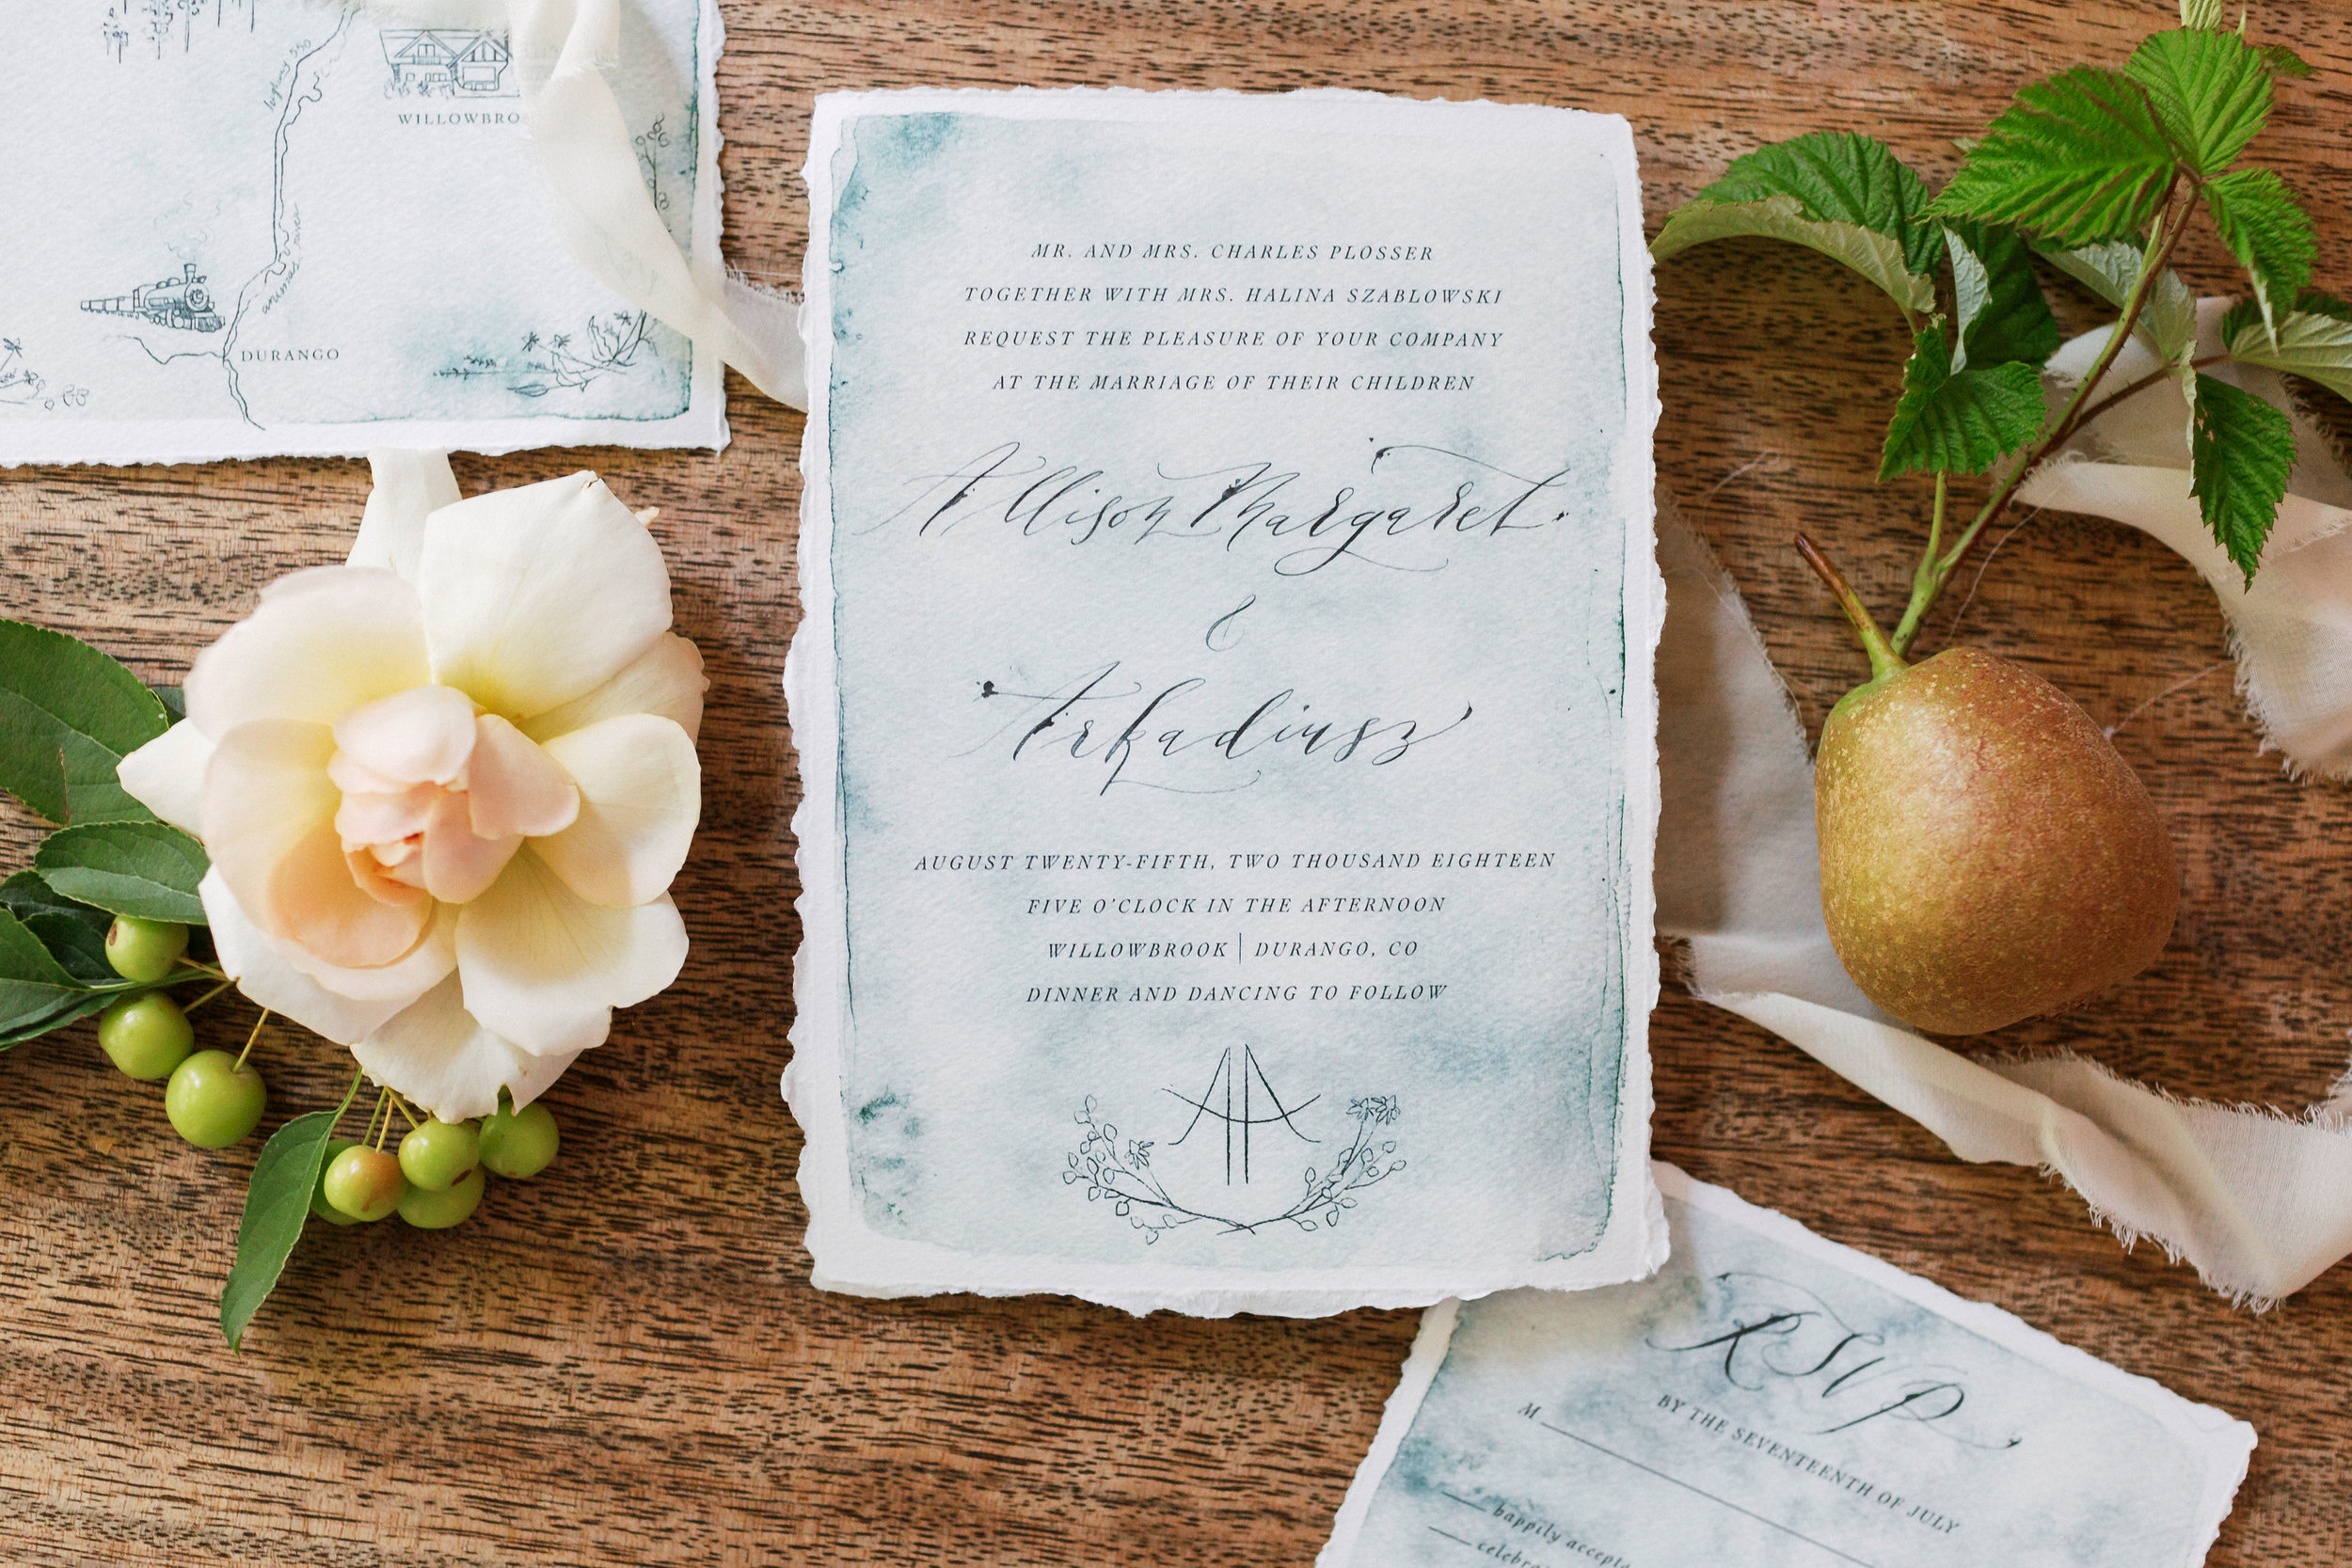 014-arek-allison-durango-wedding-lucky-malone.jpg